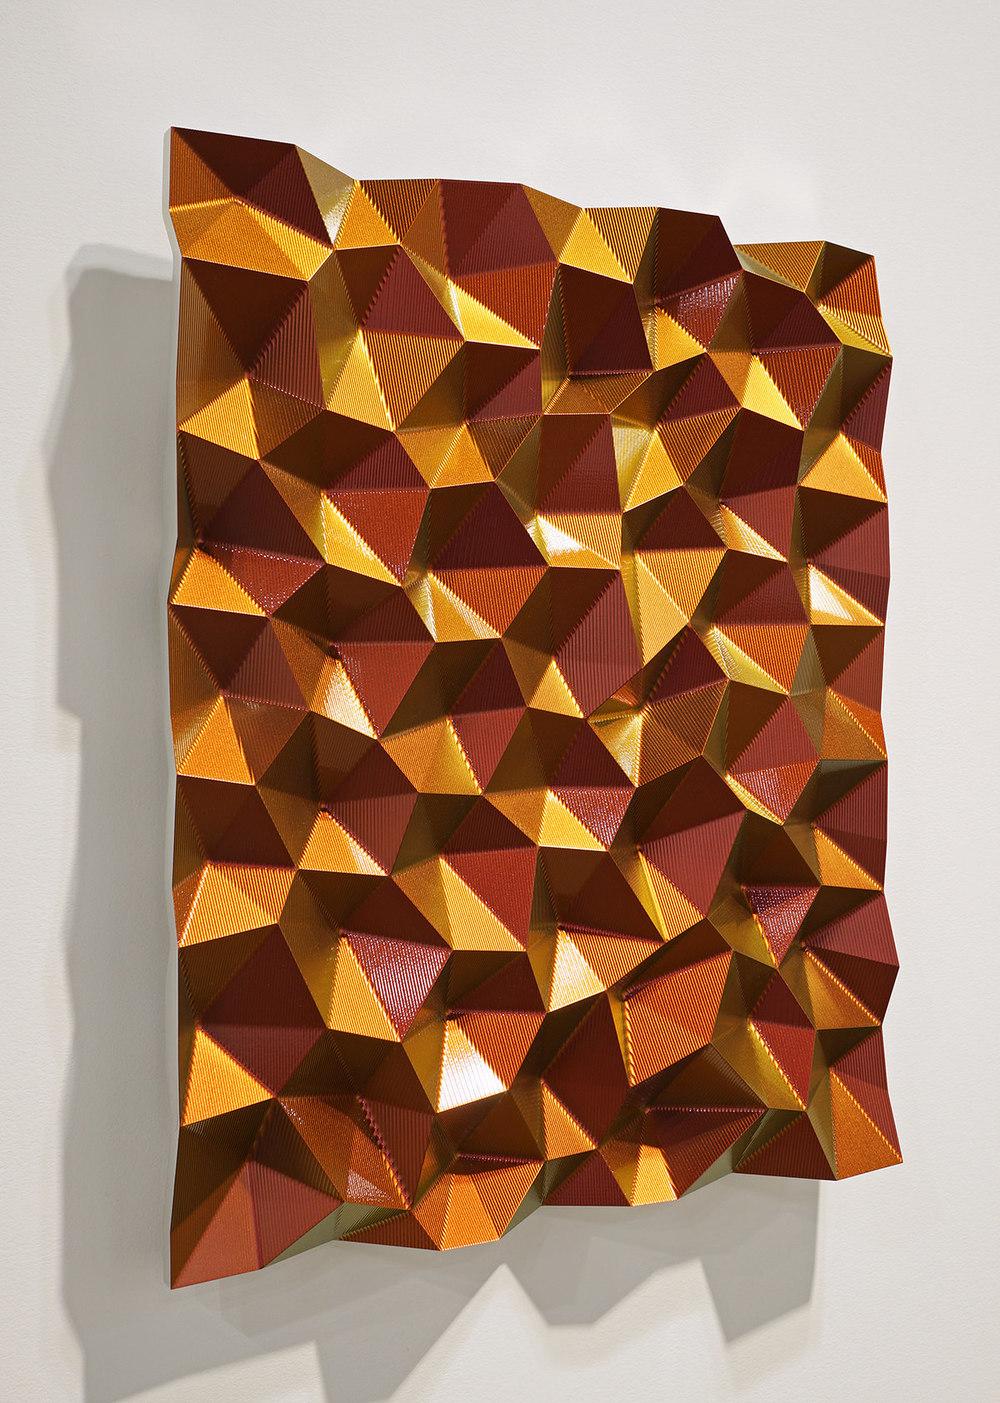 14 Hexagonal Perturbation.jpg